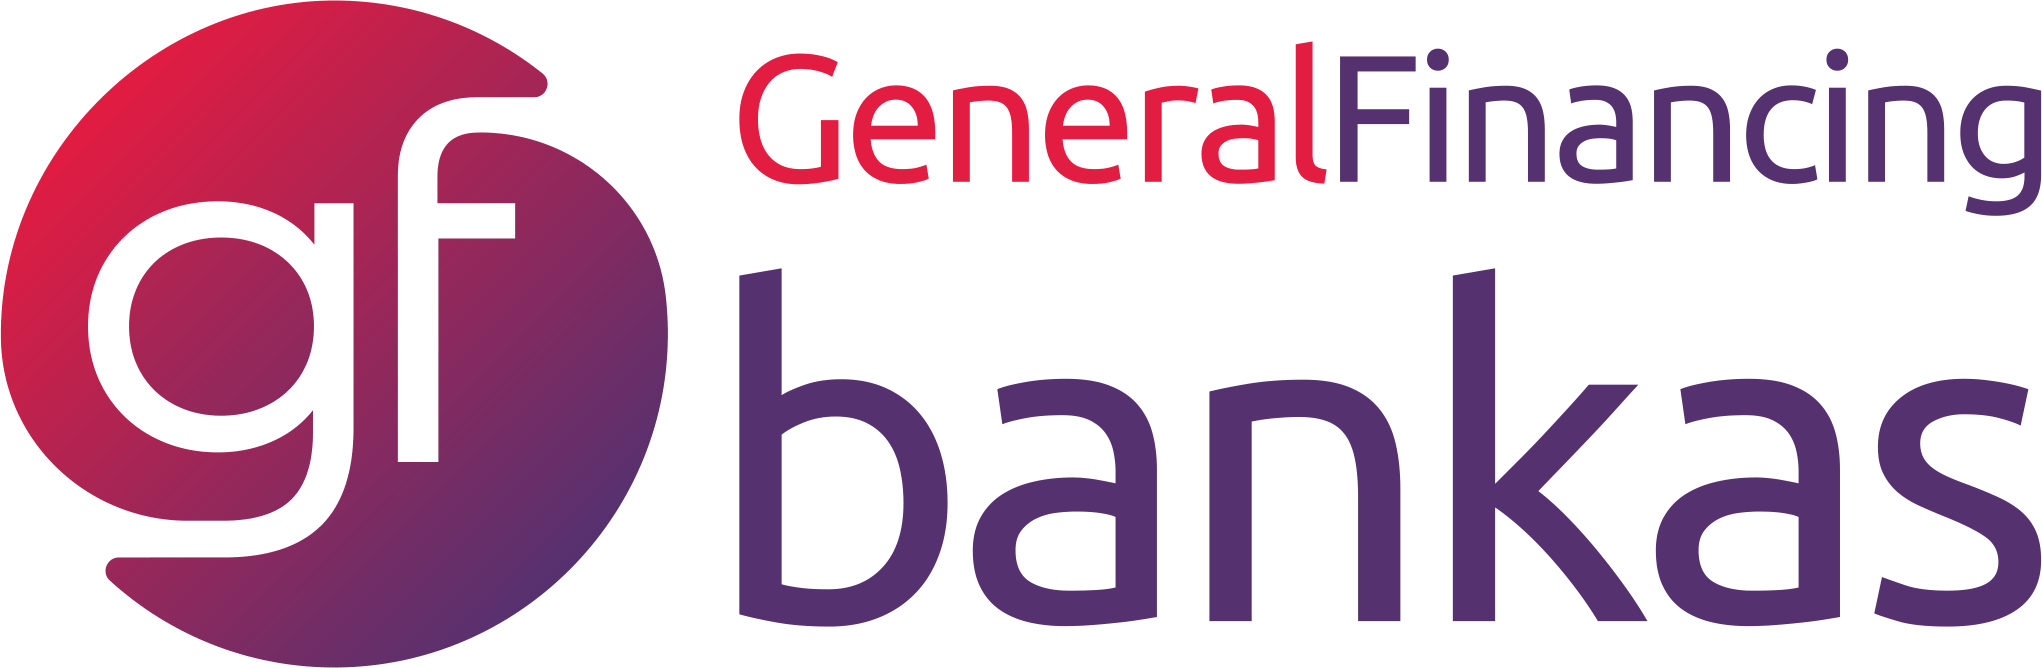 GF new logo